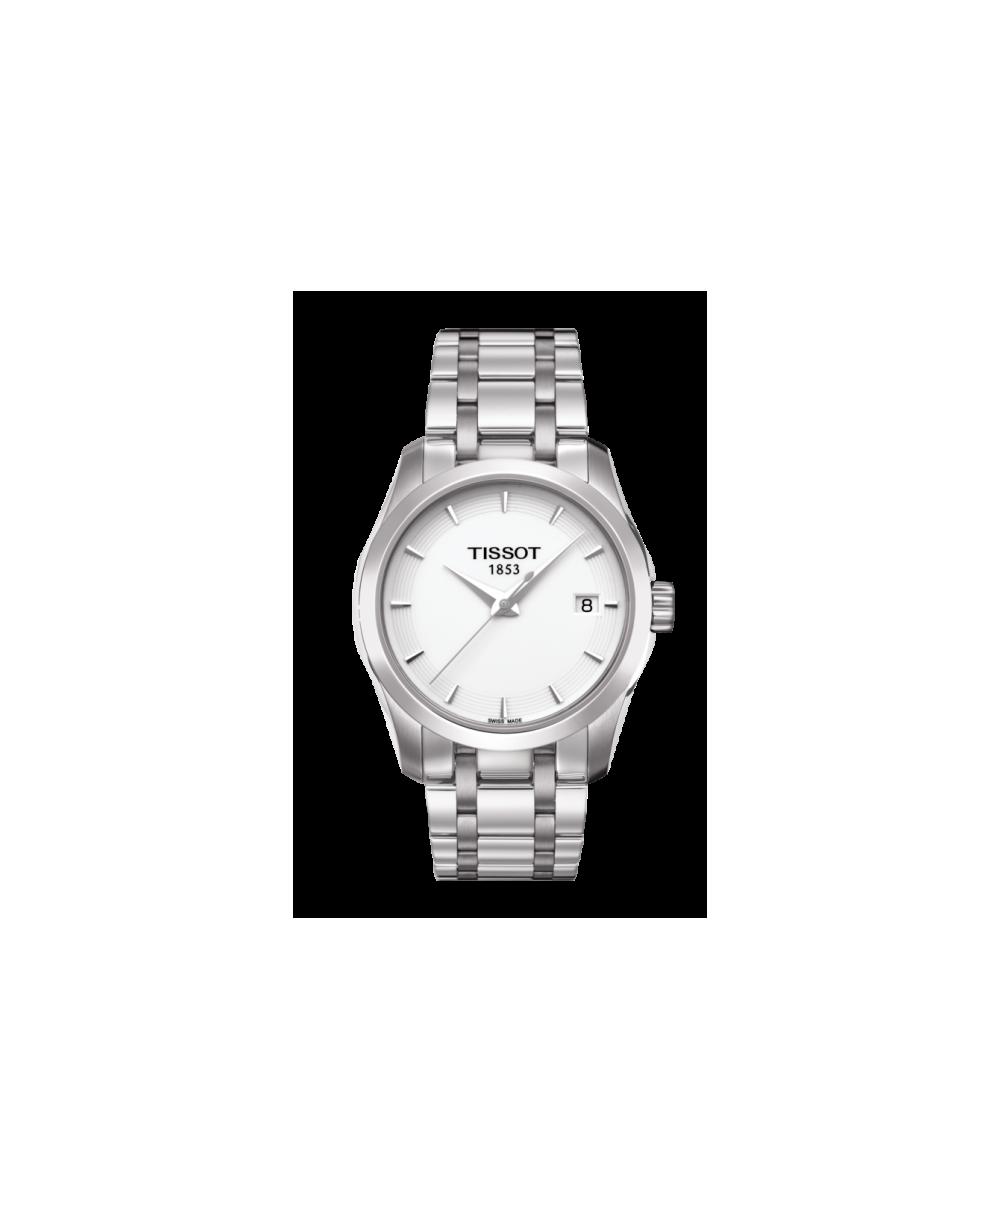 Reloj Tissot Couturier Lady Blanco